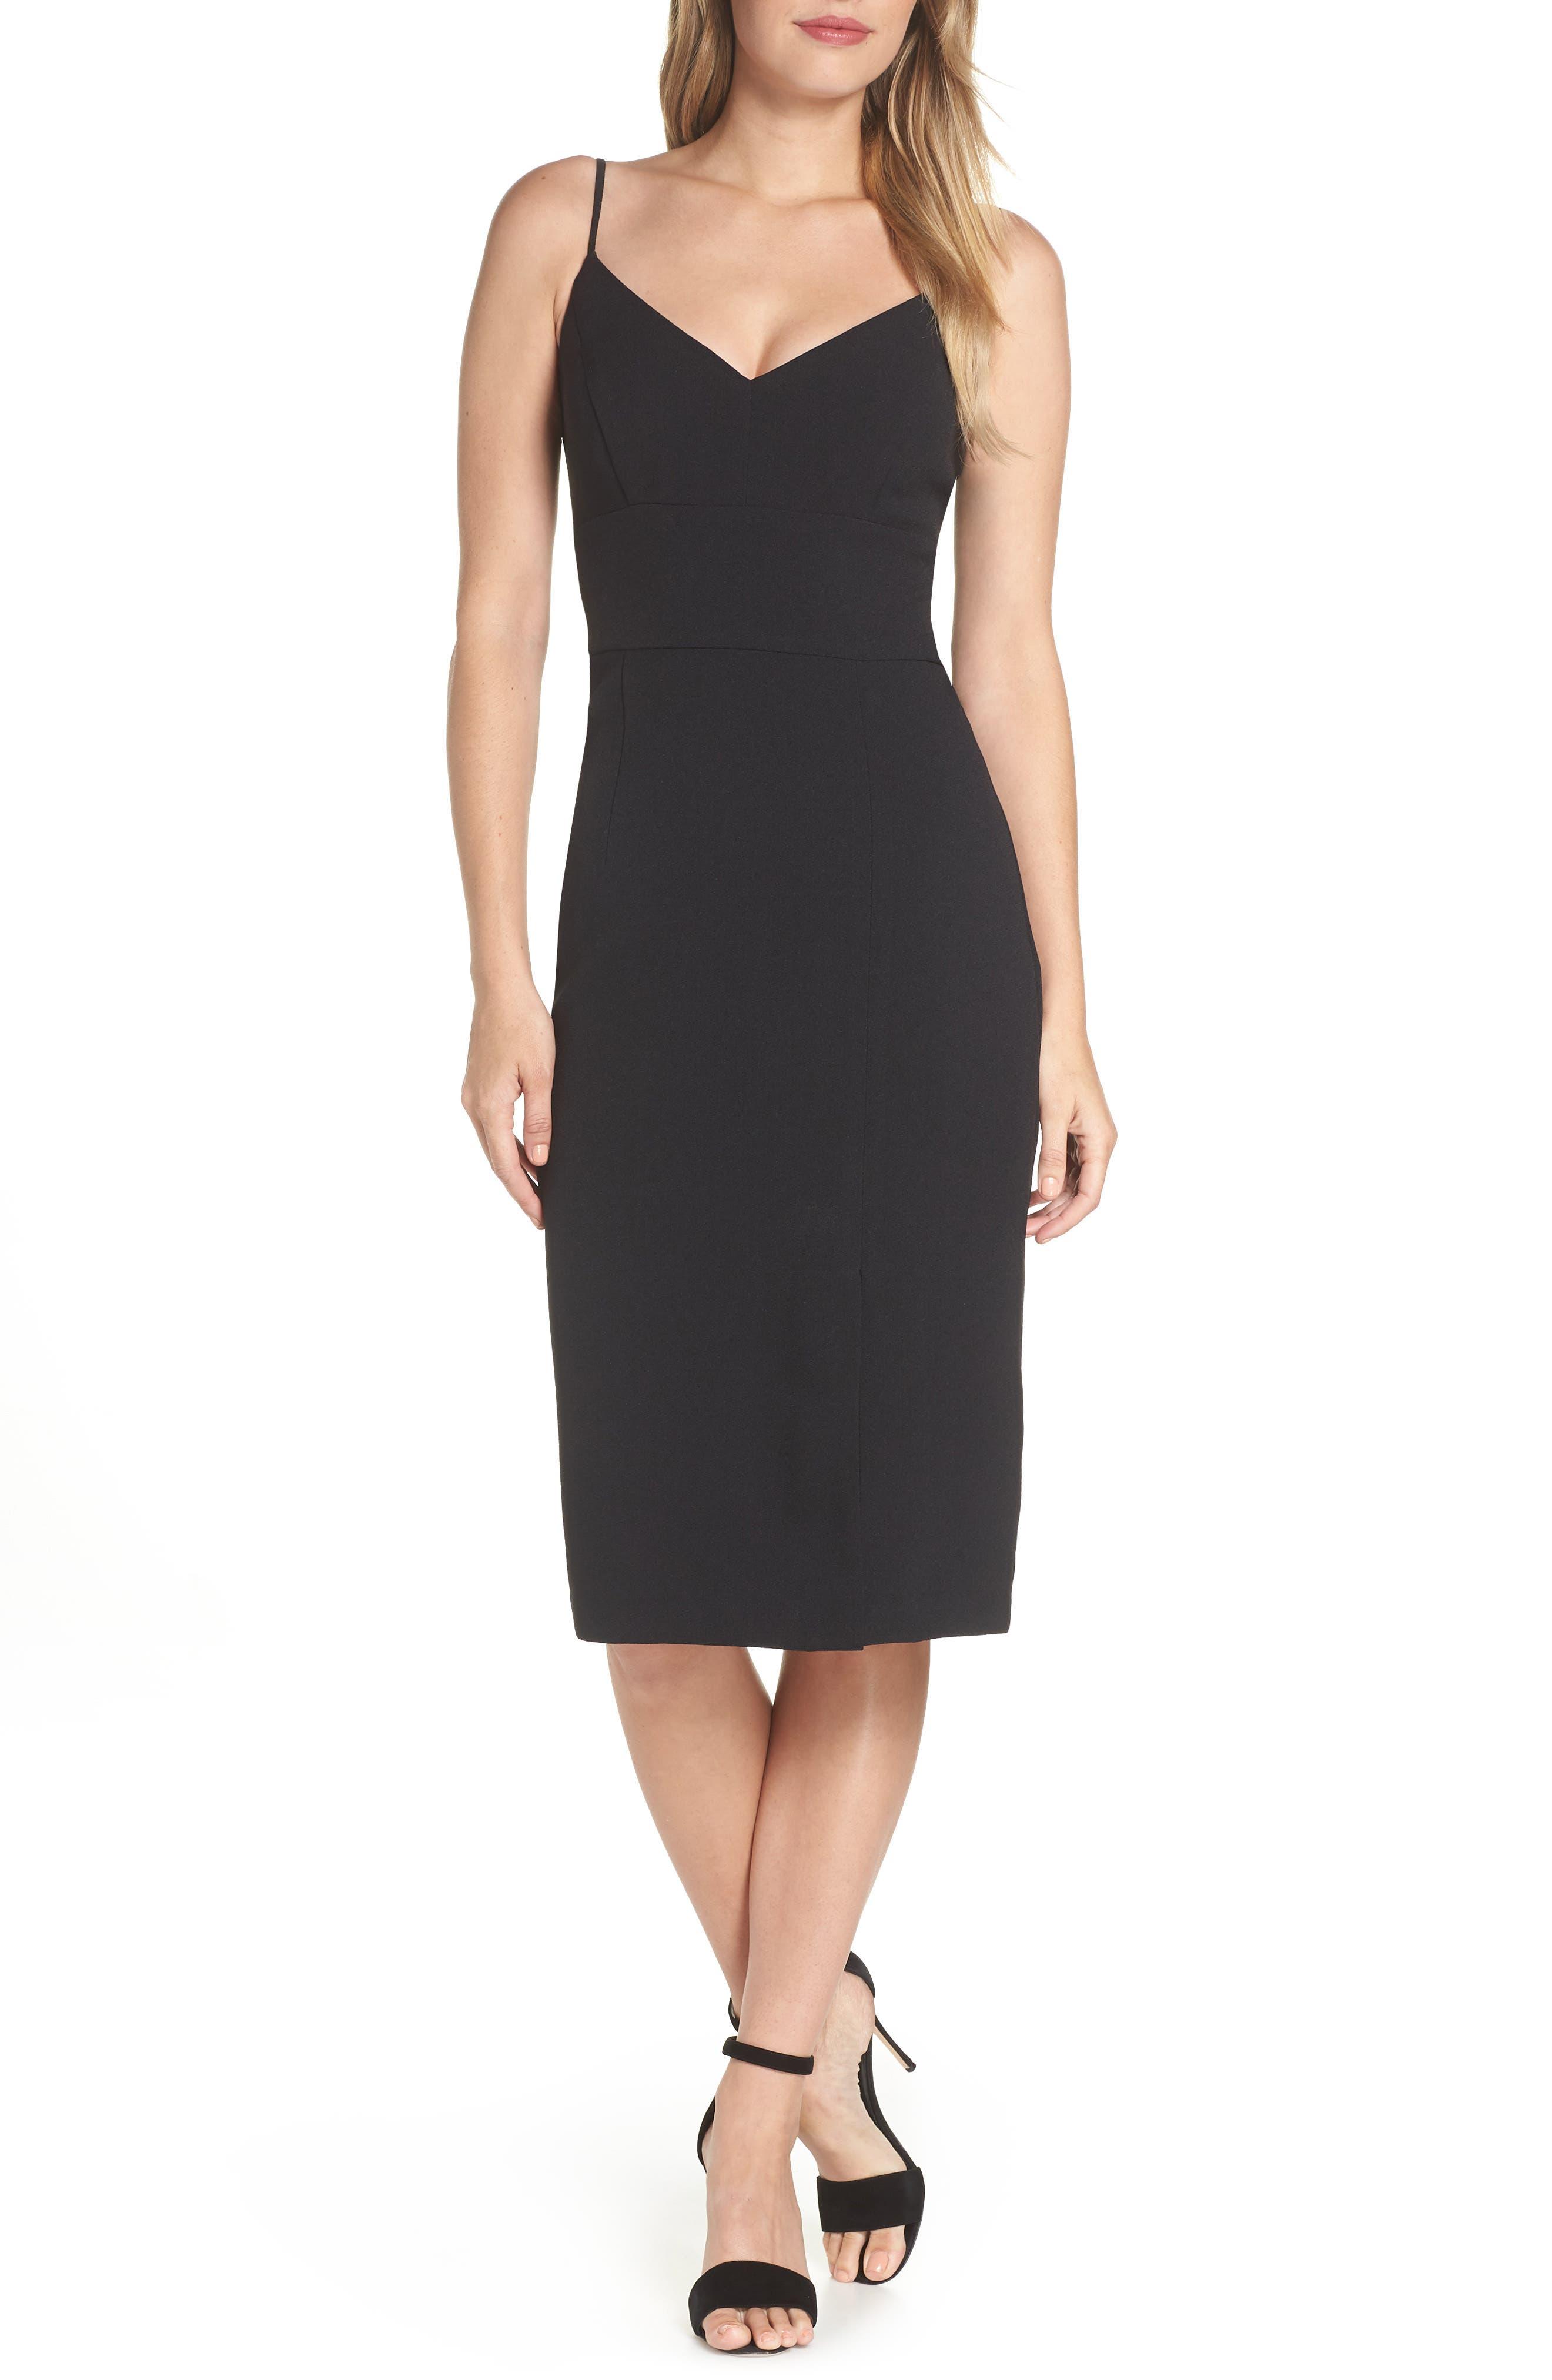 Eliza J Sleeveless Cocktail Dress, Black